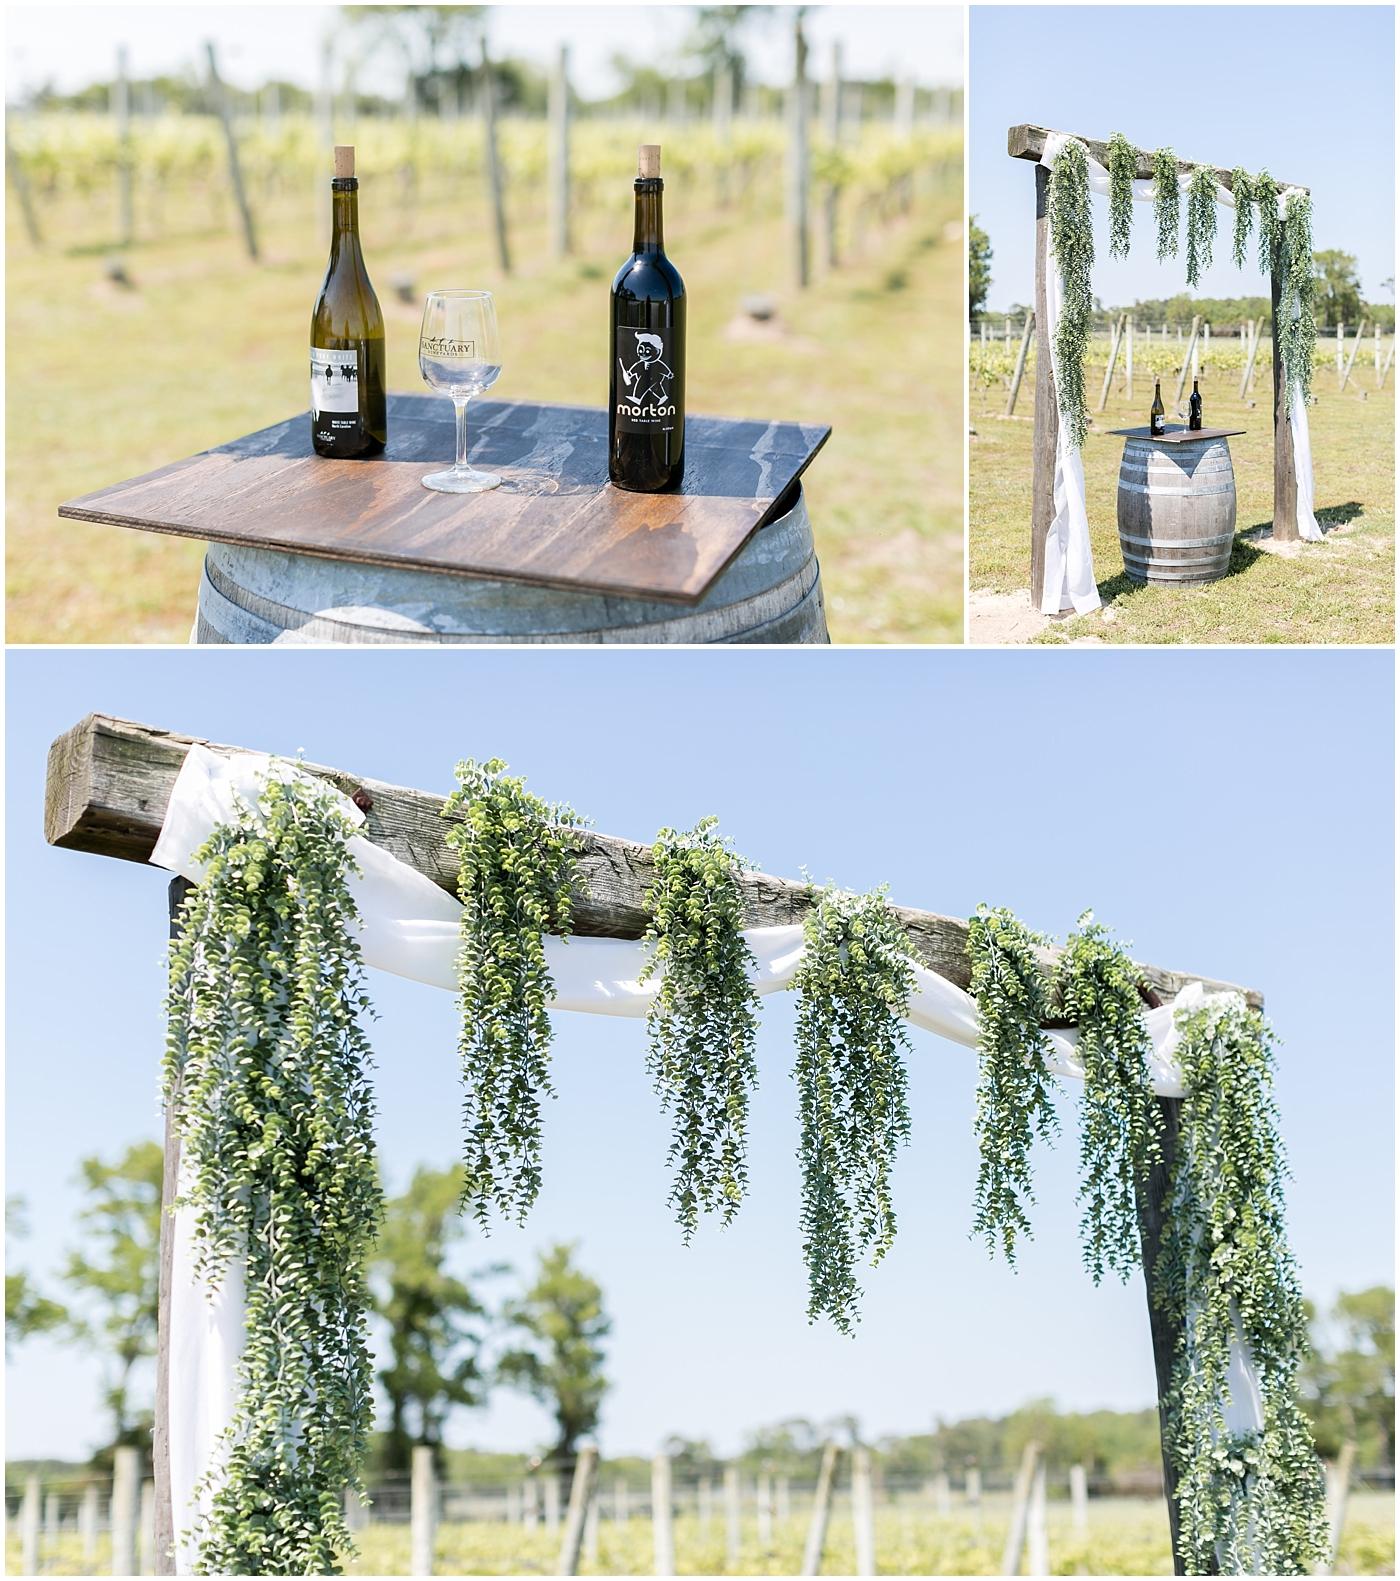 sanctuary vineyards wedding jessica ryan photography, winery wedding ceremony